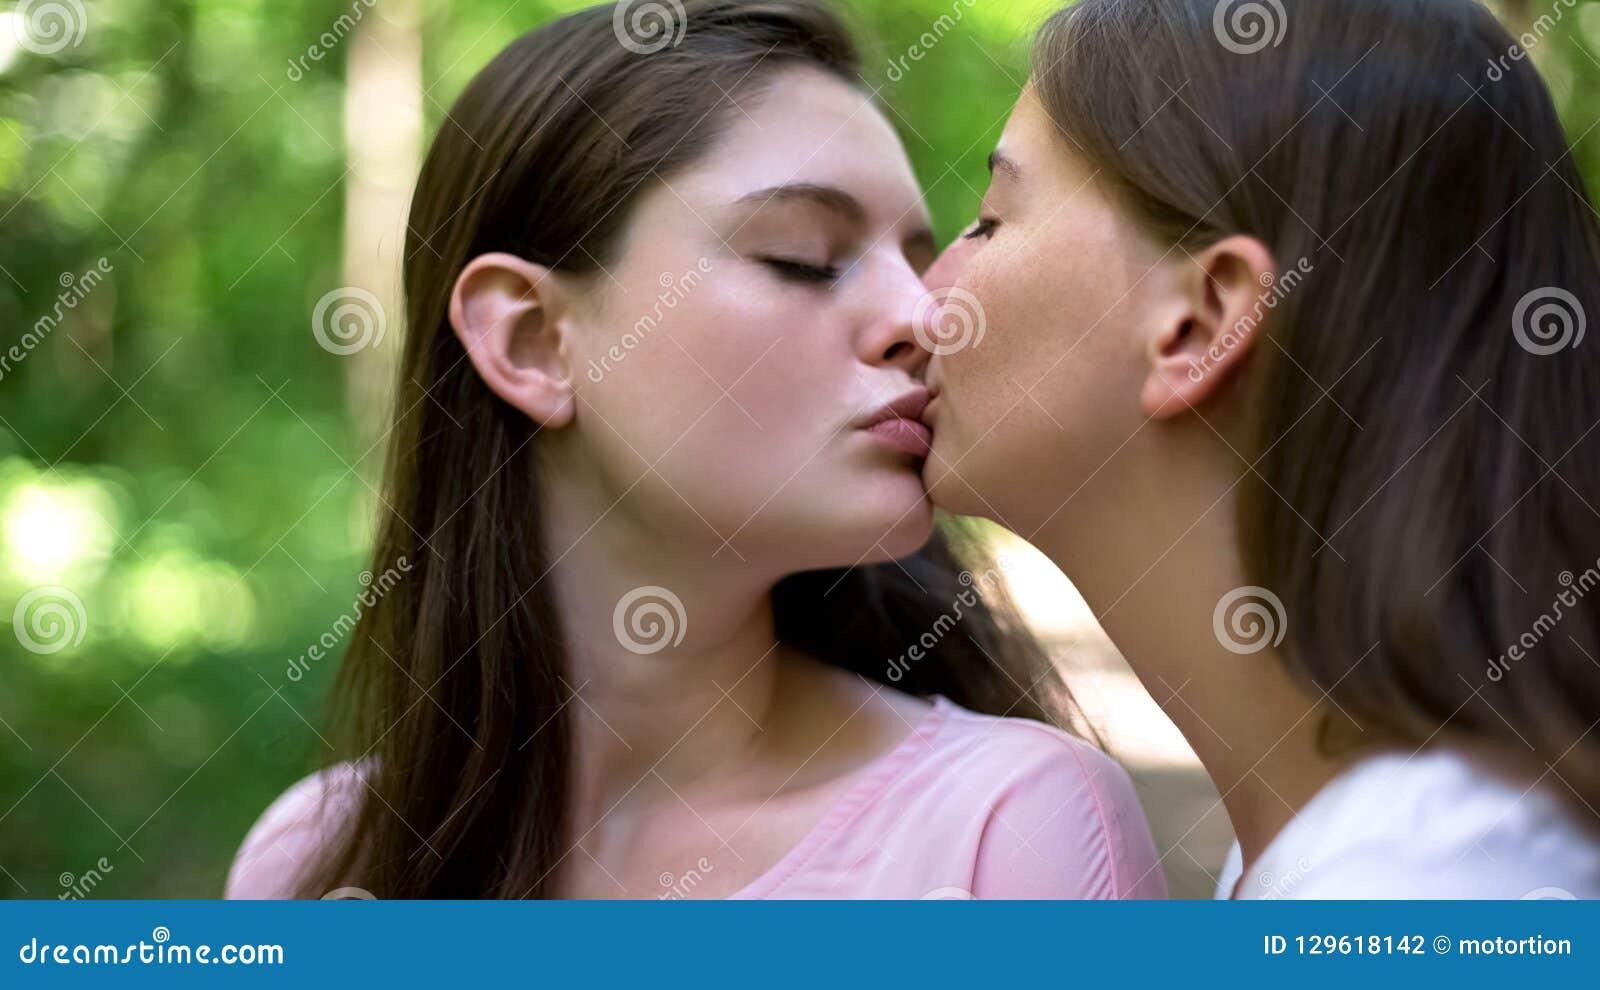 lesbian intimate kissing